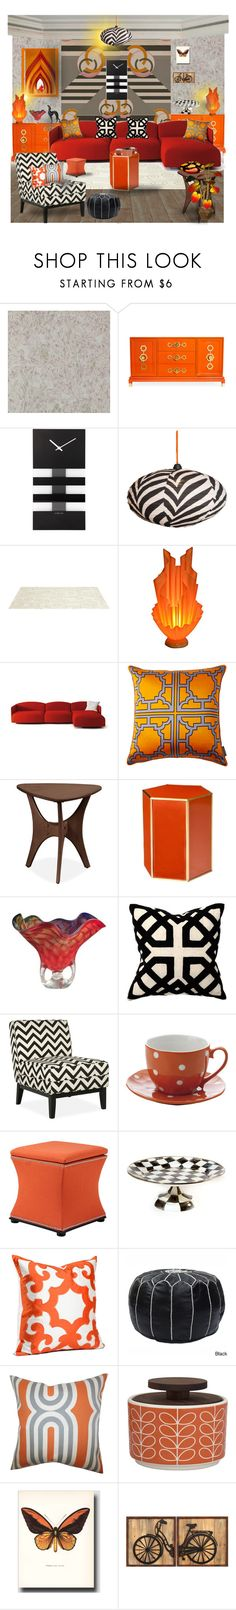 """Retro"" by amara-m-hafeez ❤ liked on Polyvore featuring interior, interiors, interior design, home, home decor, interior decorating, Jonathan Adler, NeXtime, Somerset Bay and Universal Lighting and Decor"